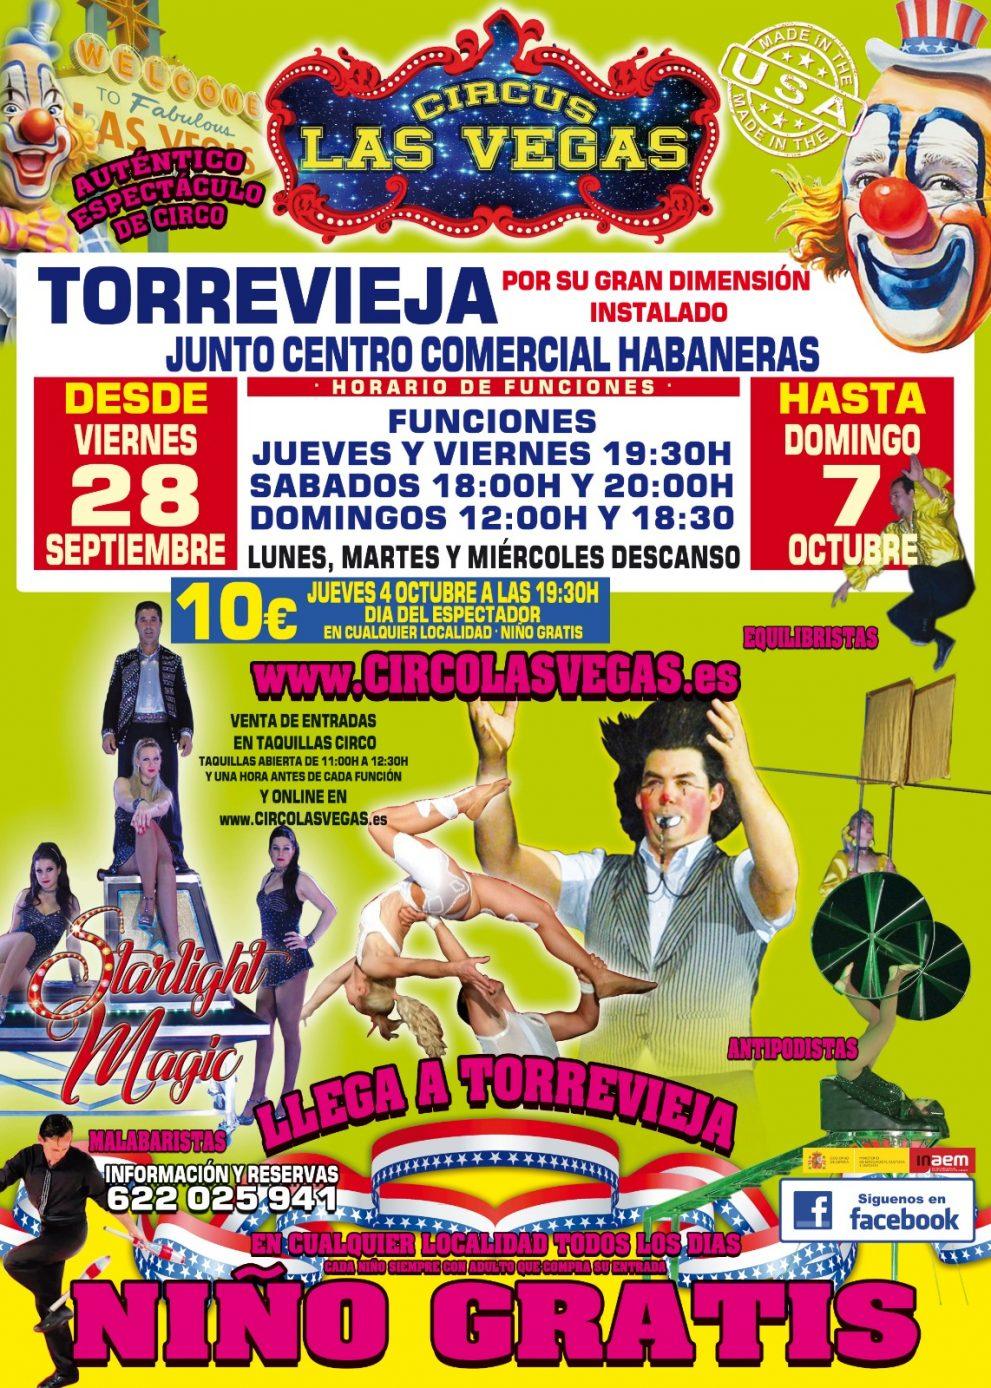 Circus las Vegas llega a Torrevieja